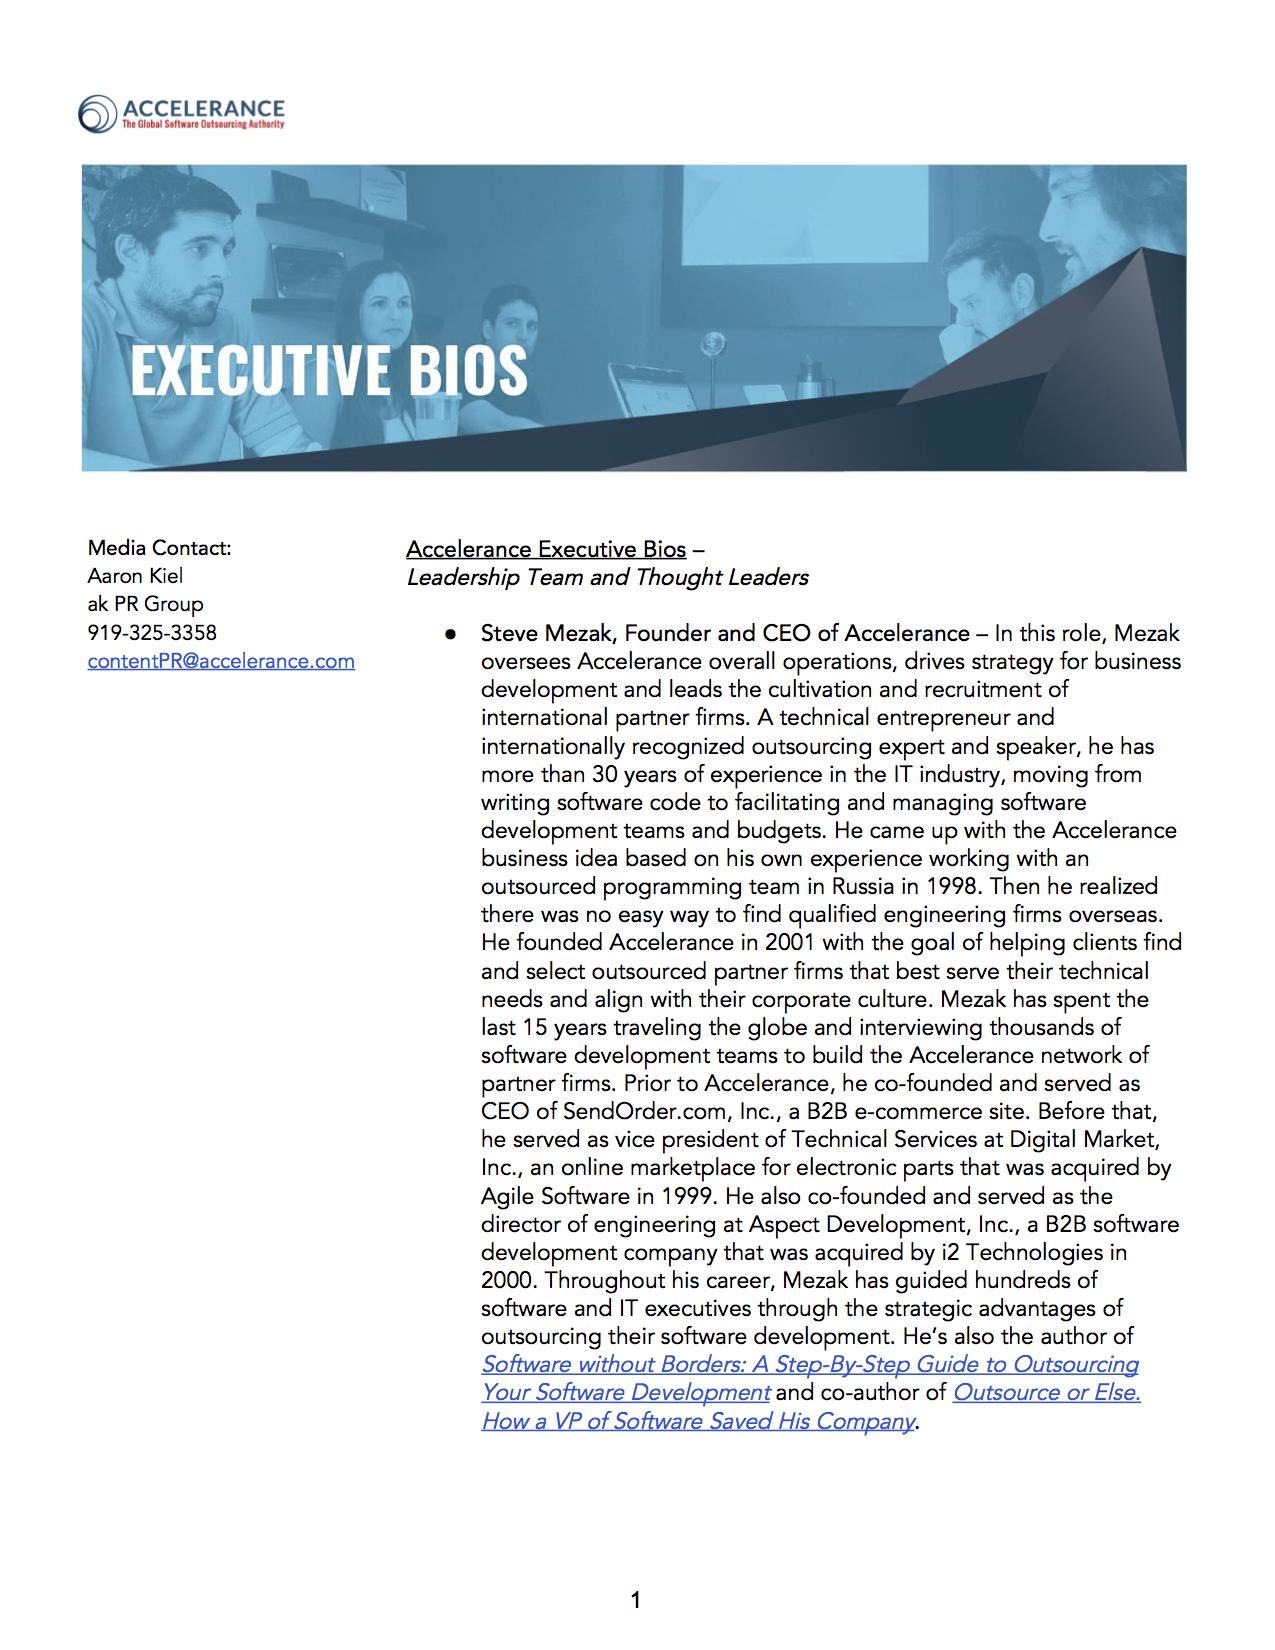 PressKit-ExecutiveBios.png